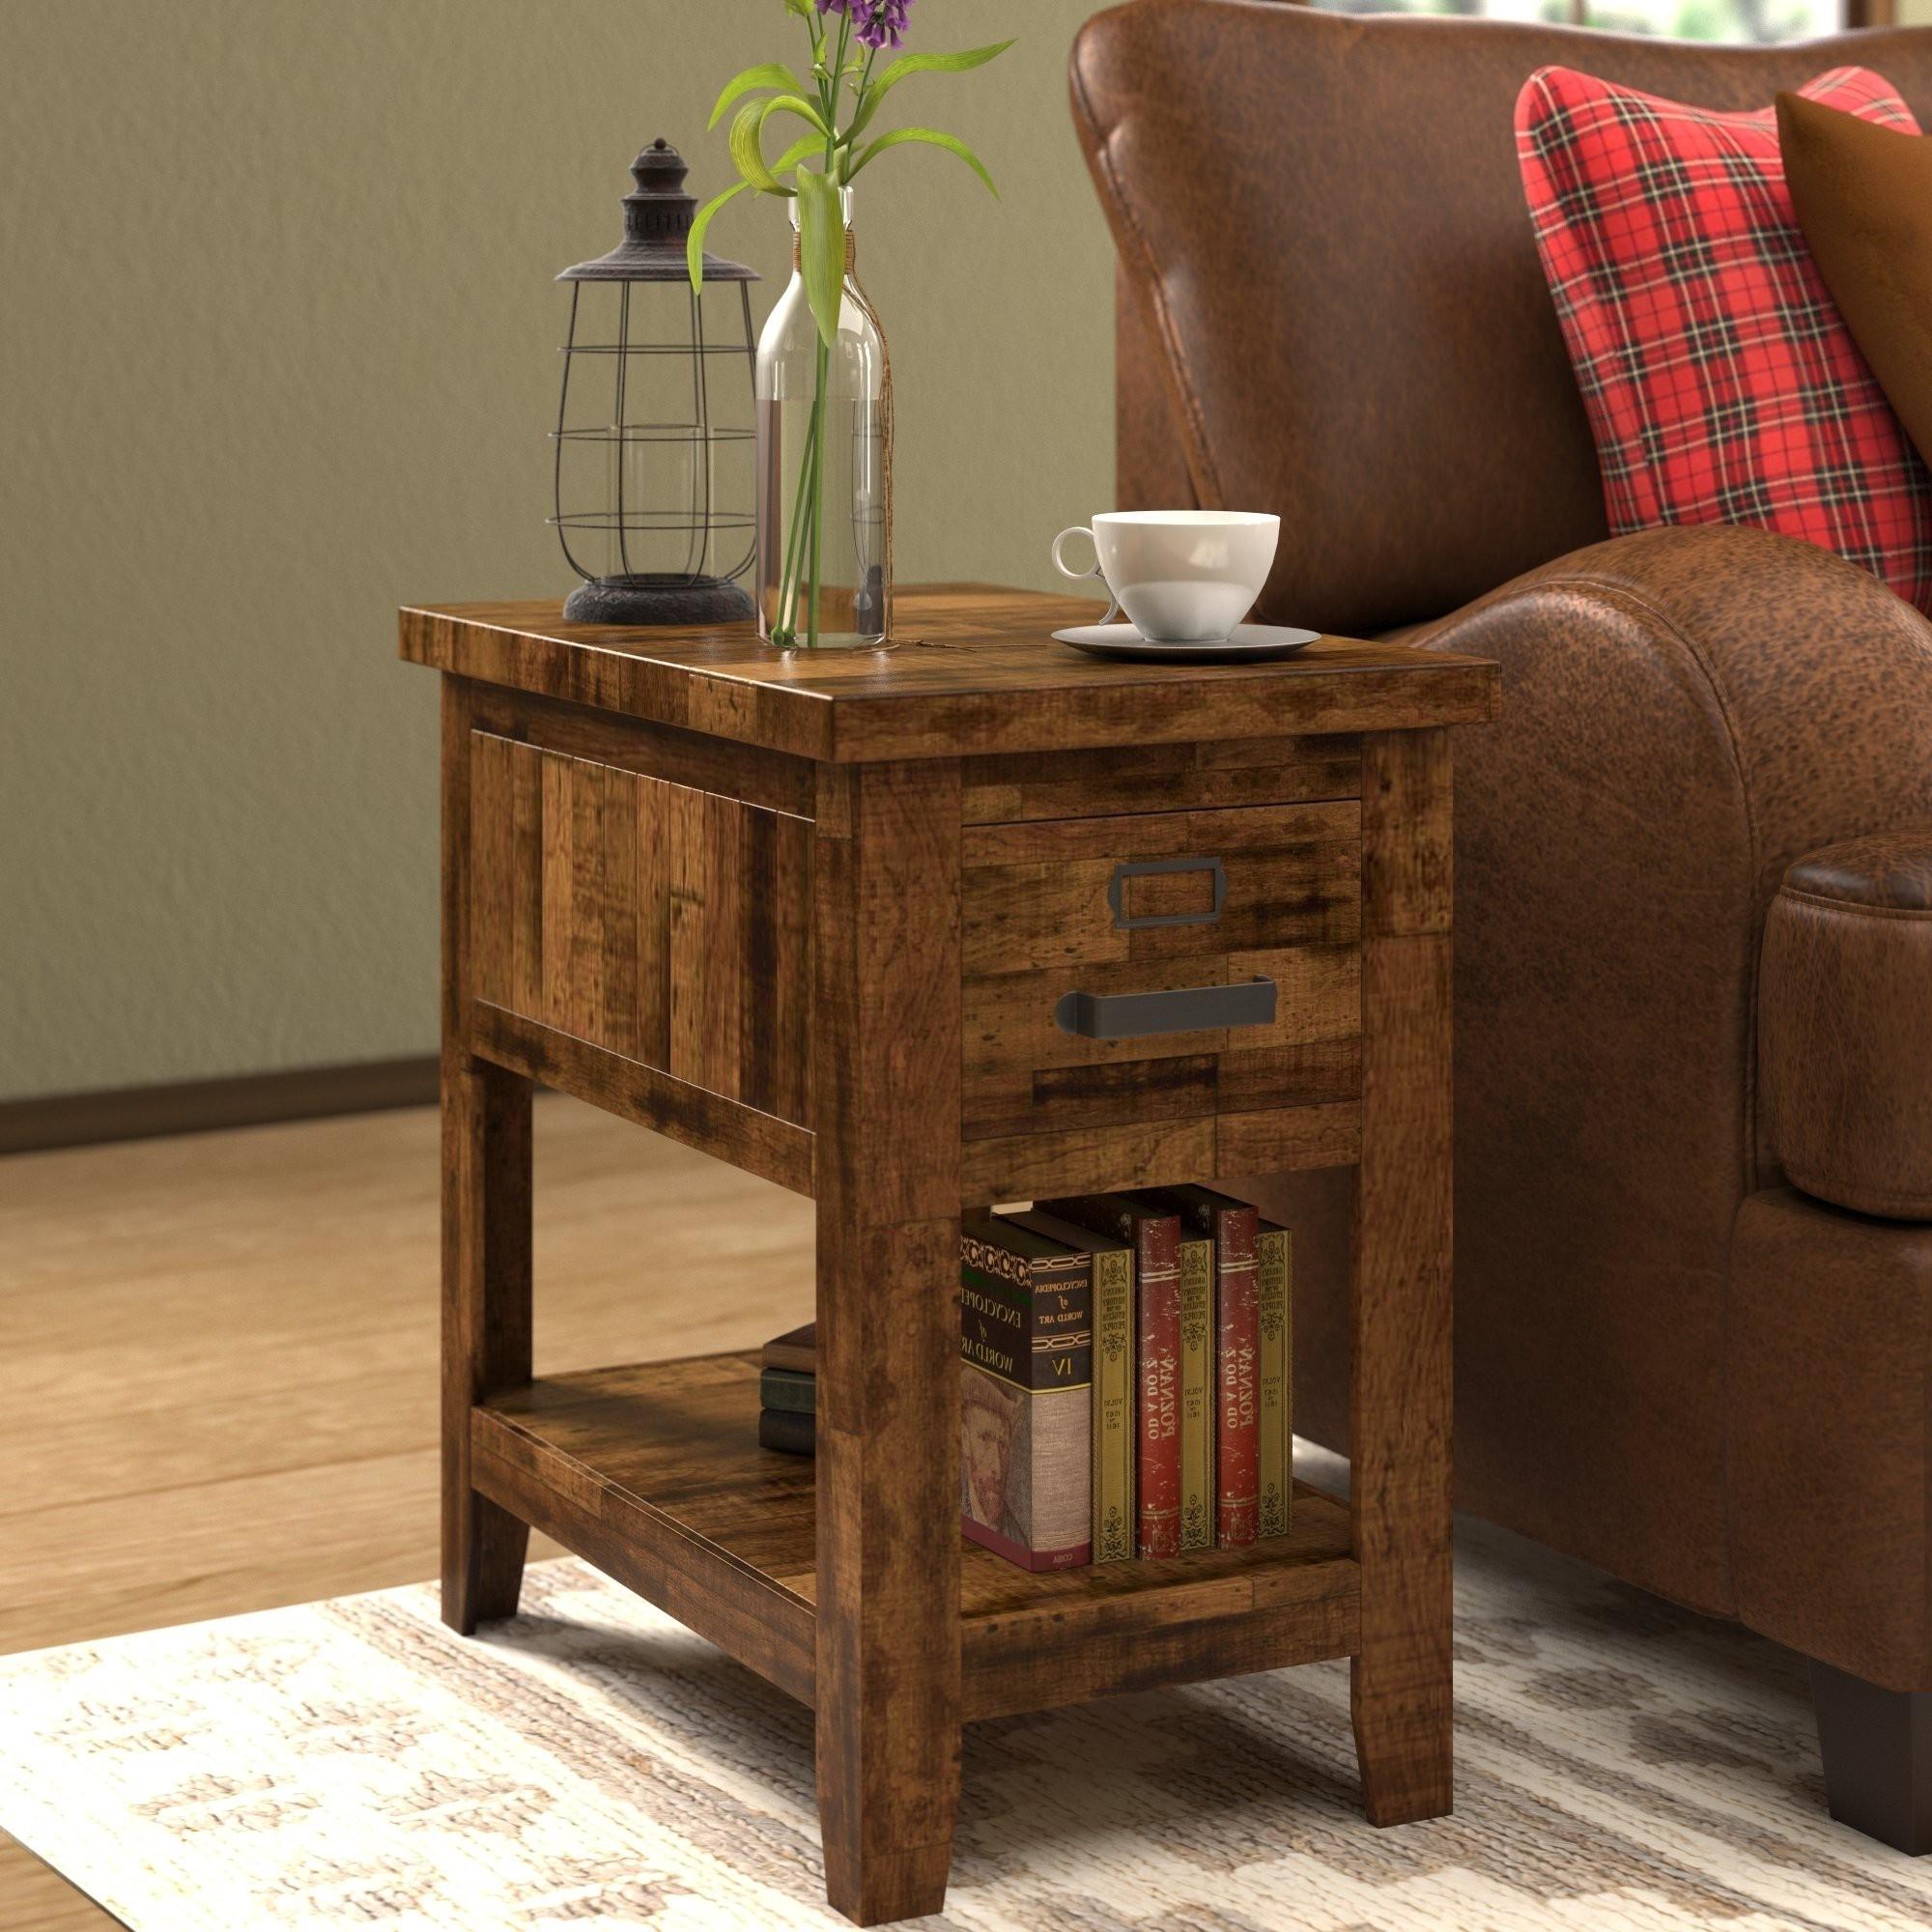 Davidrodca For Preferred Oslo Burl Wood Veneer Coffee Tables (View 13 of 20)